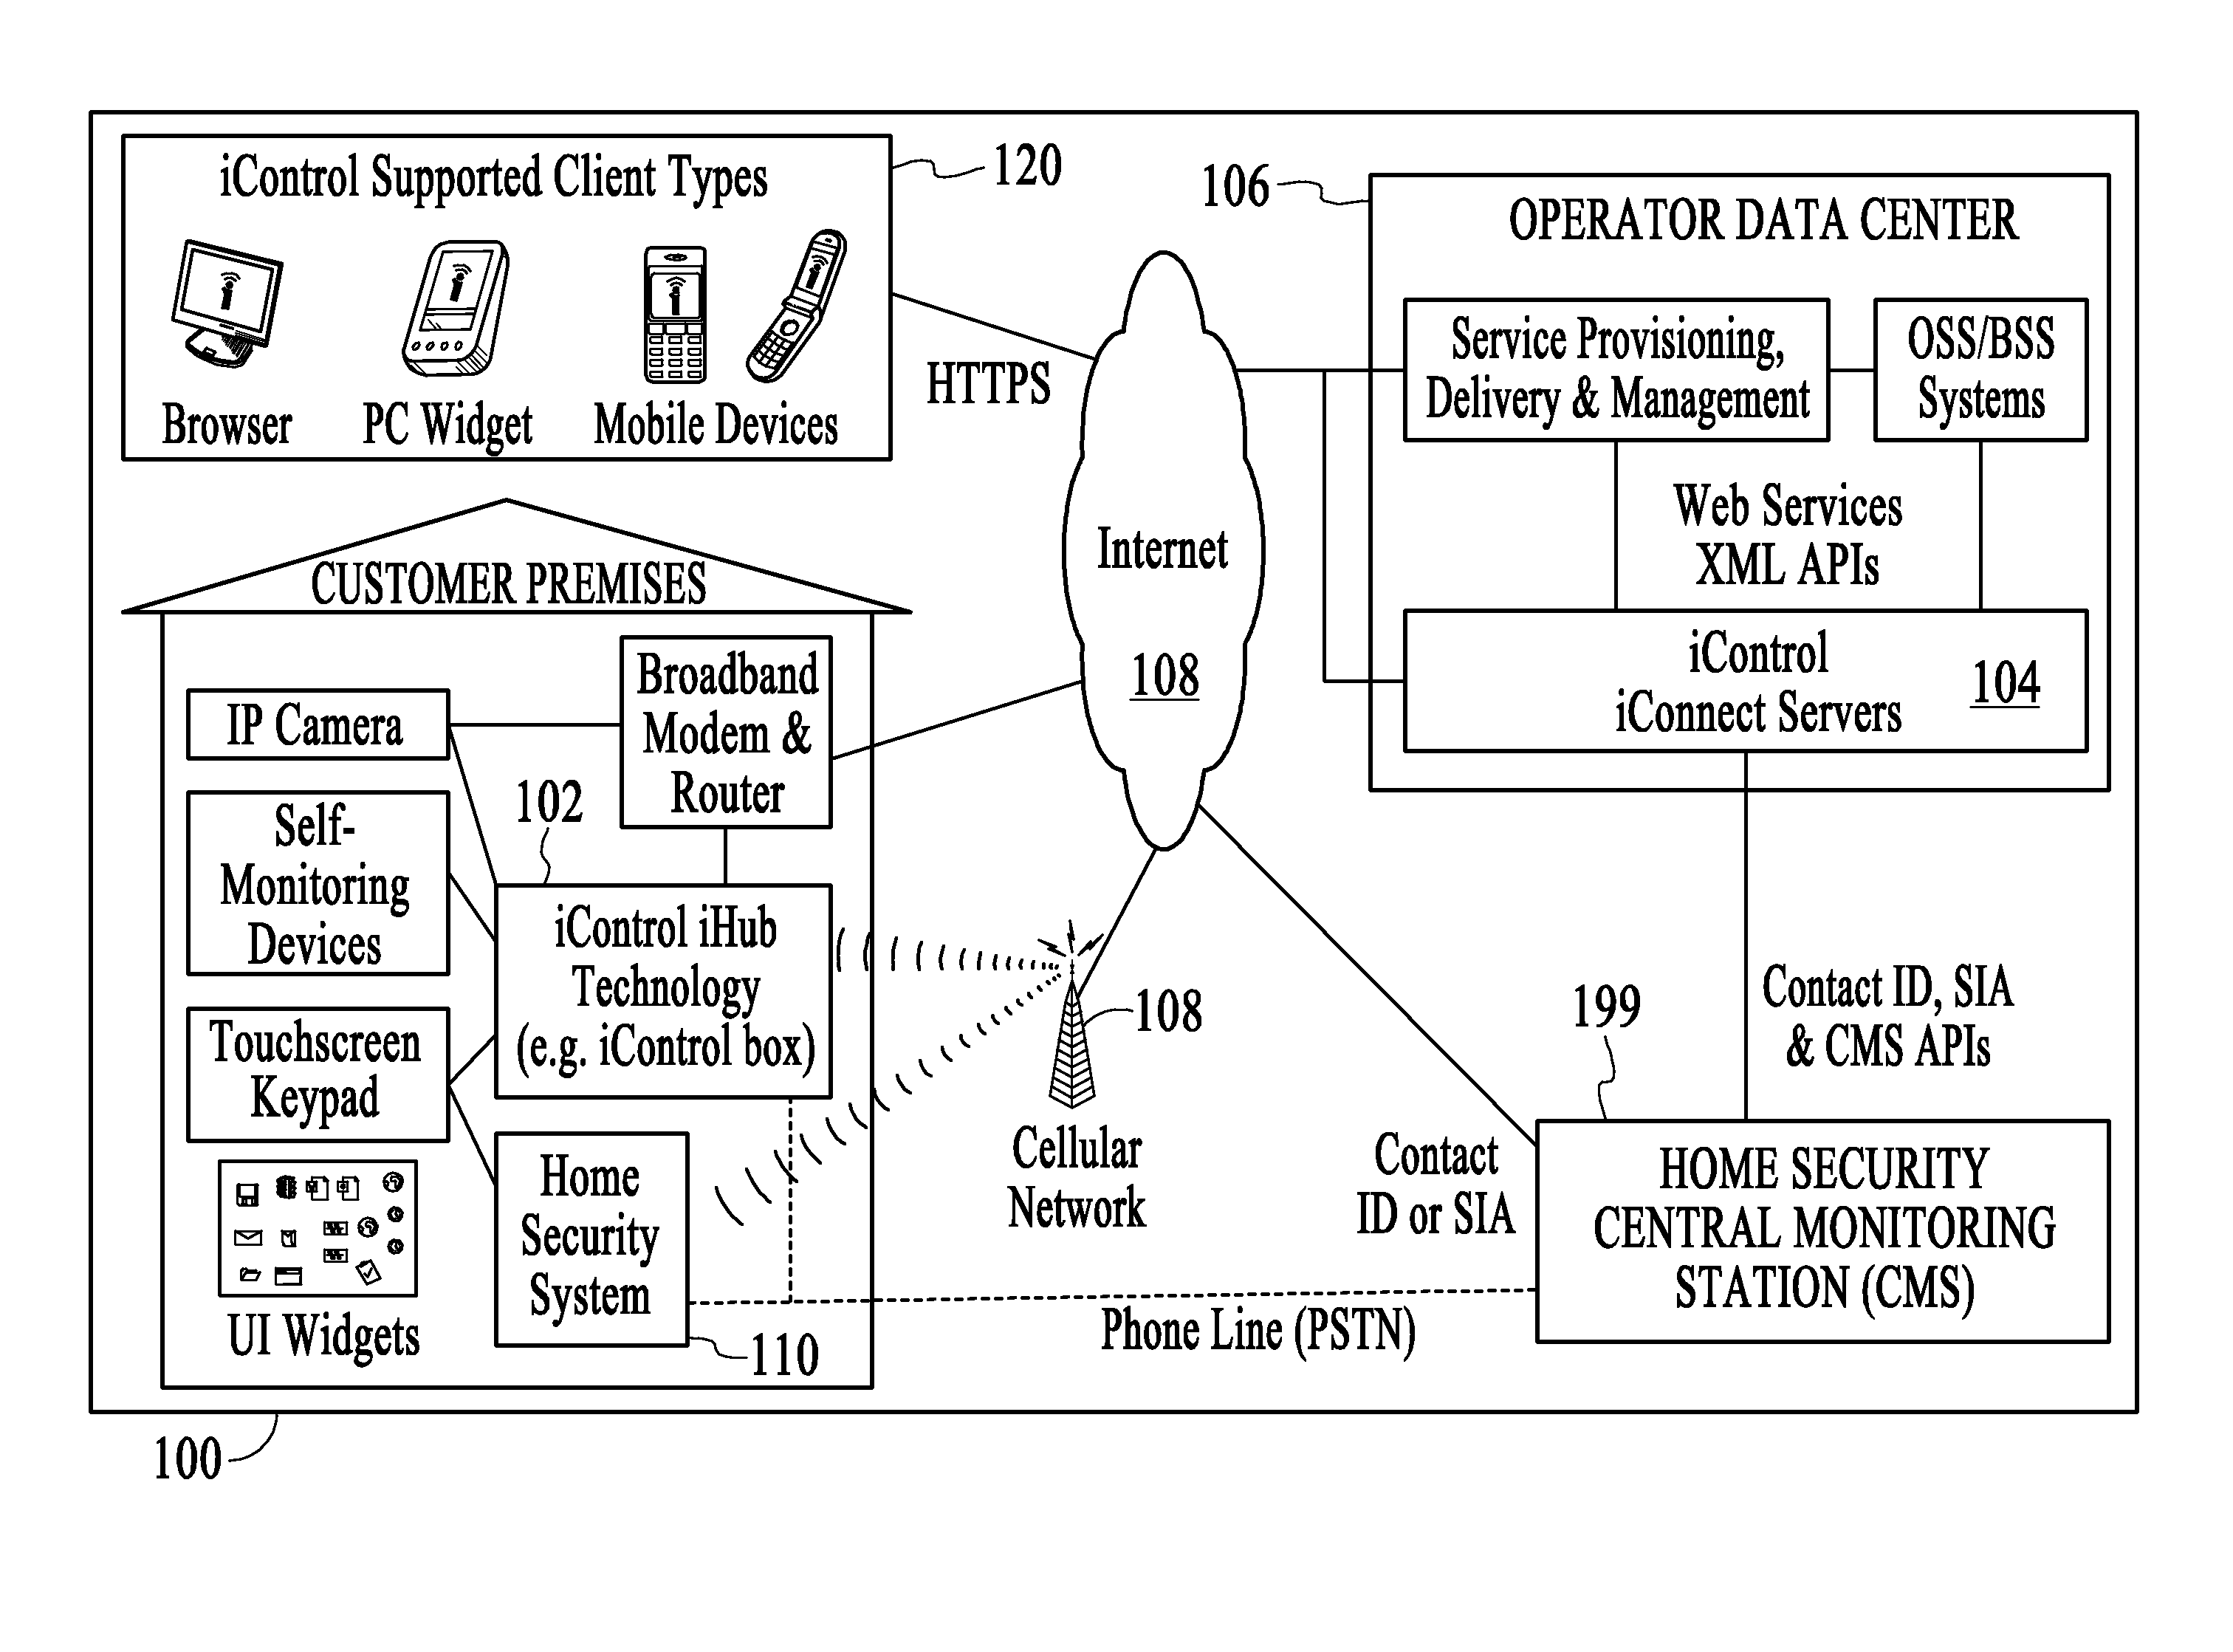 Patent US 9,628,440 B2